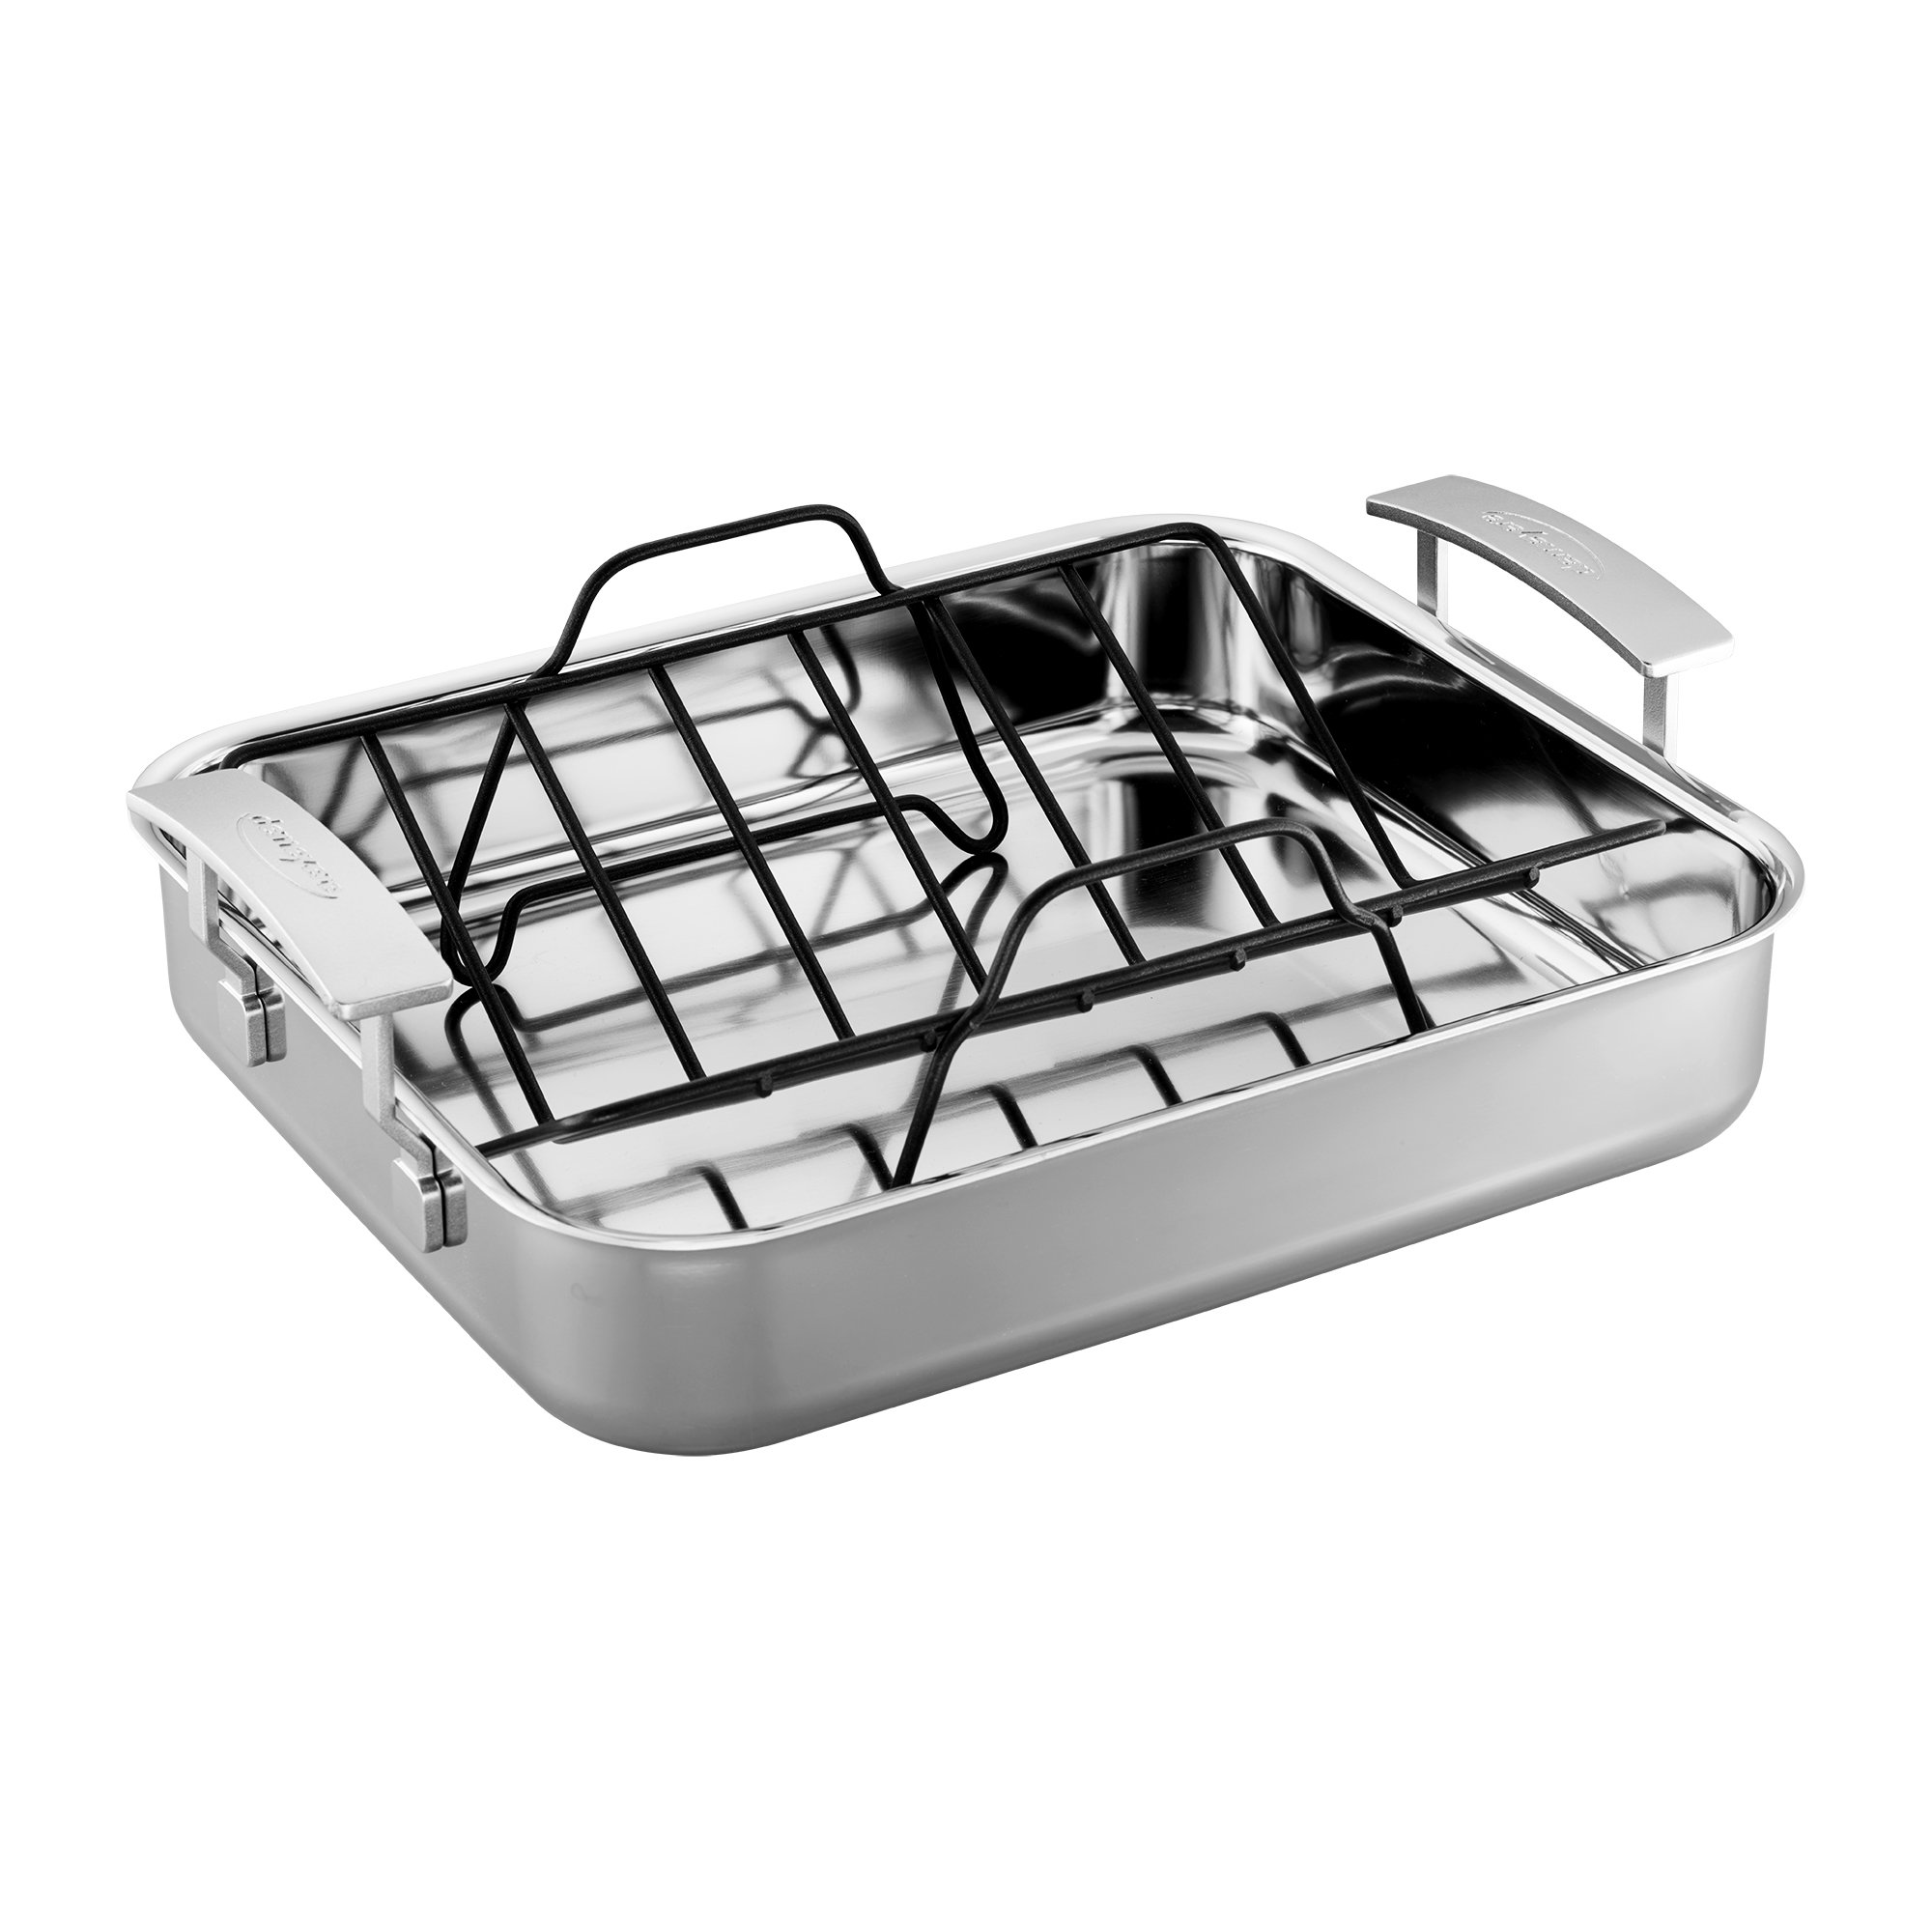 Demeyere Industry 5-Ply 15.7 X 13.3'' Stainless Steel Roasting Pan